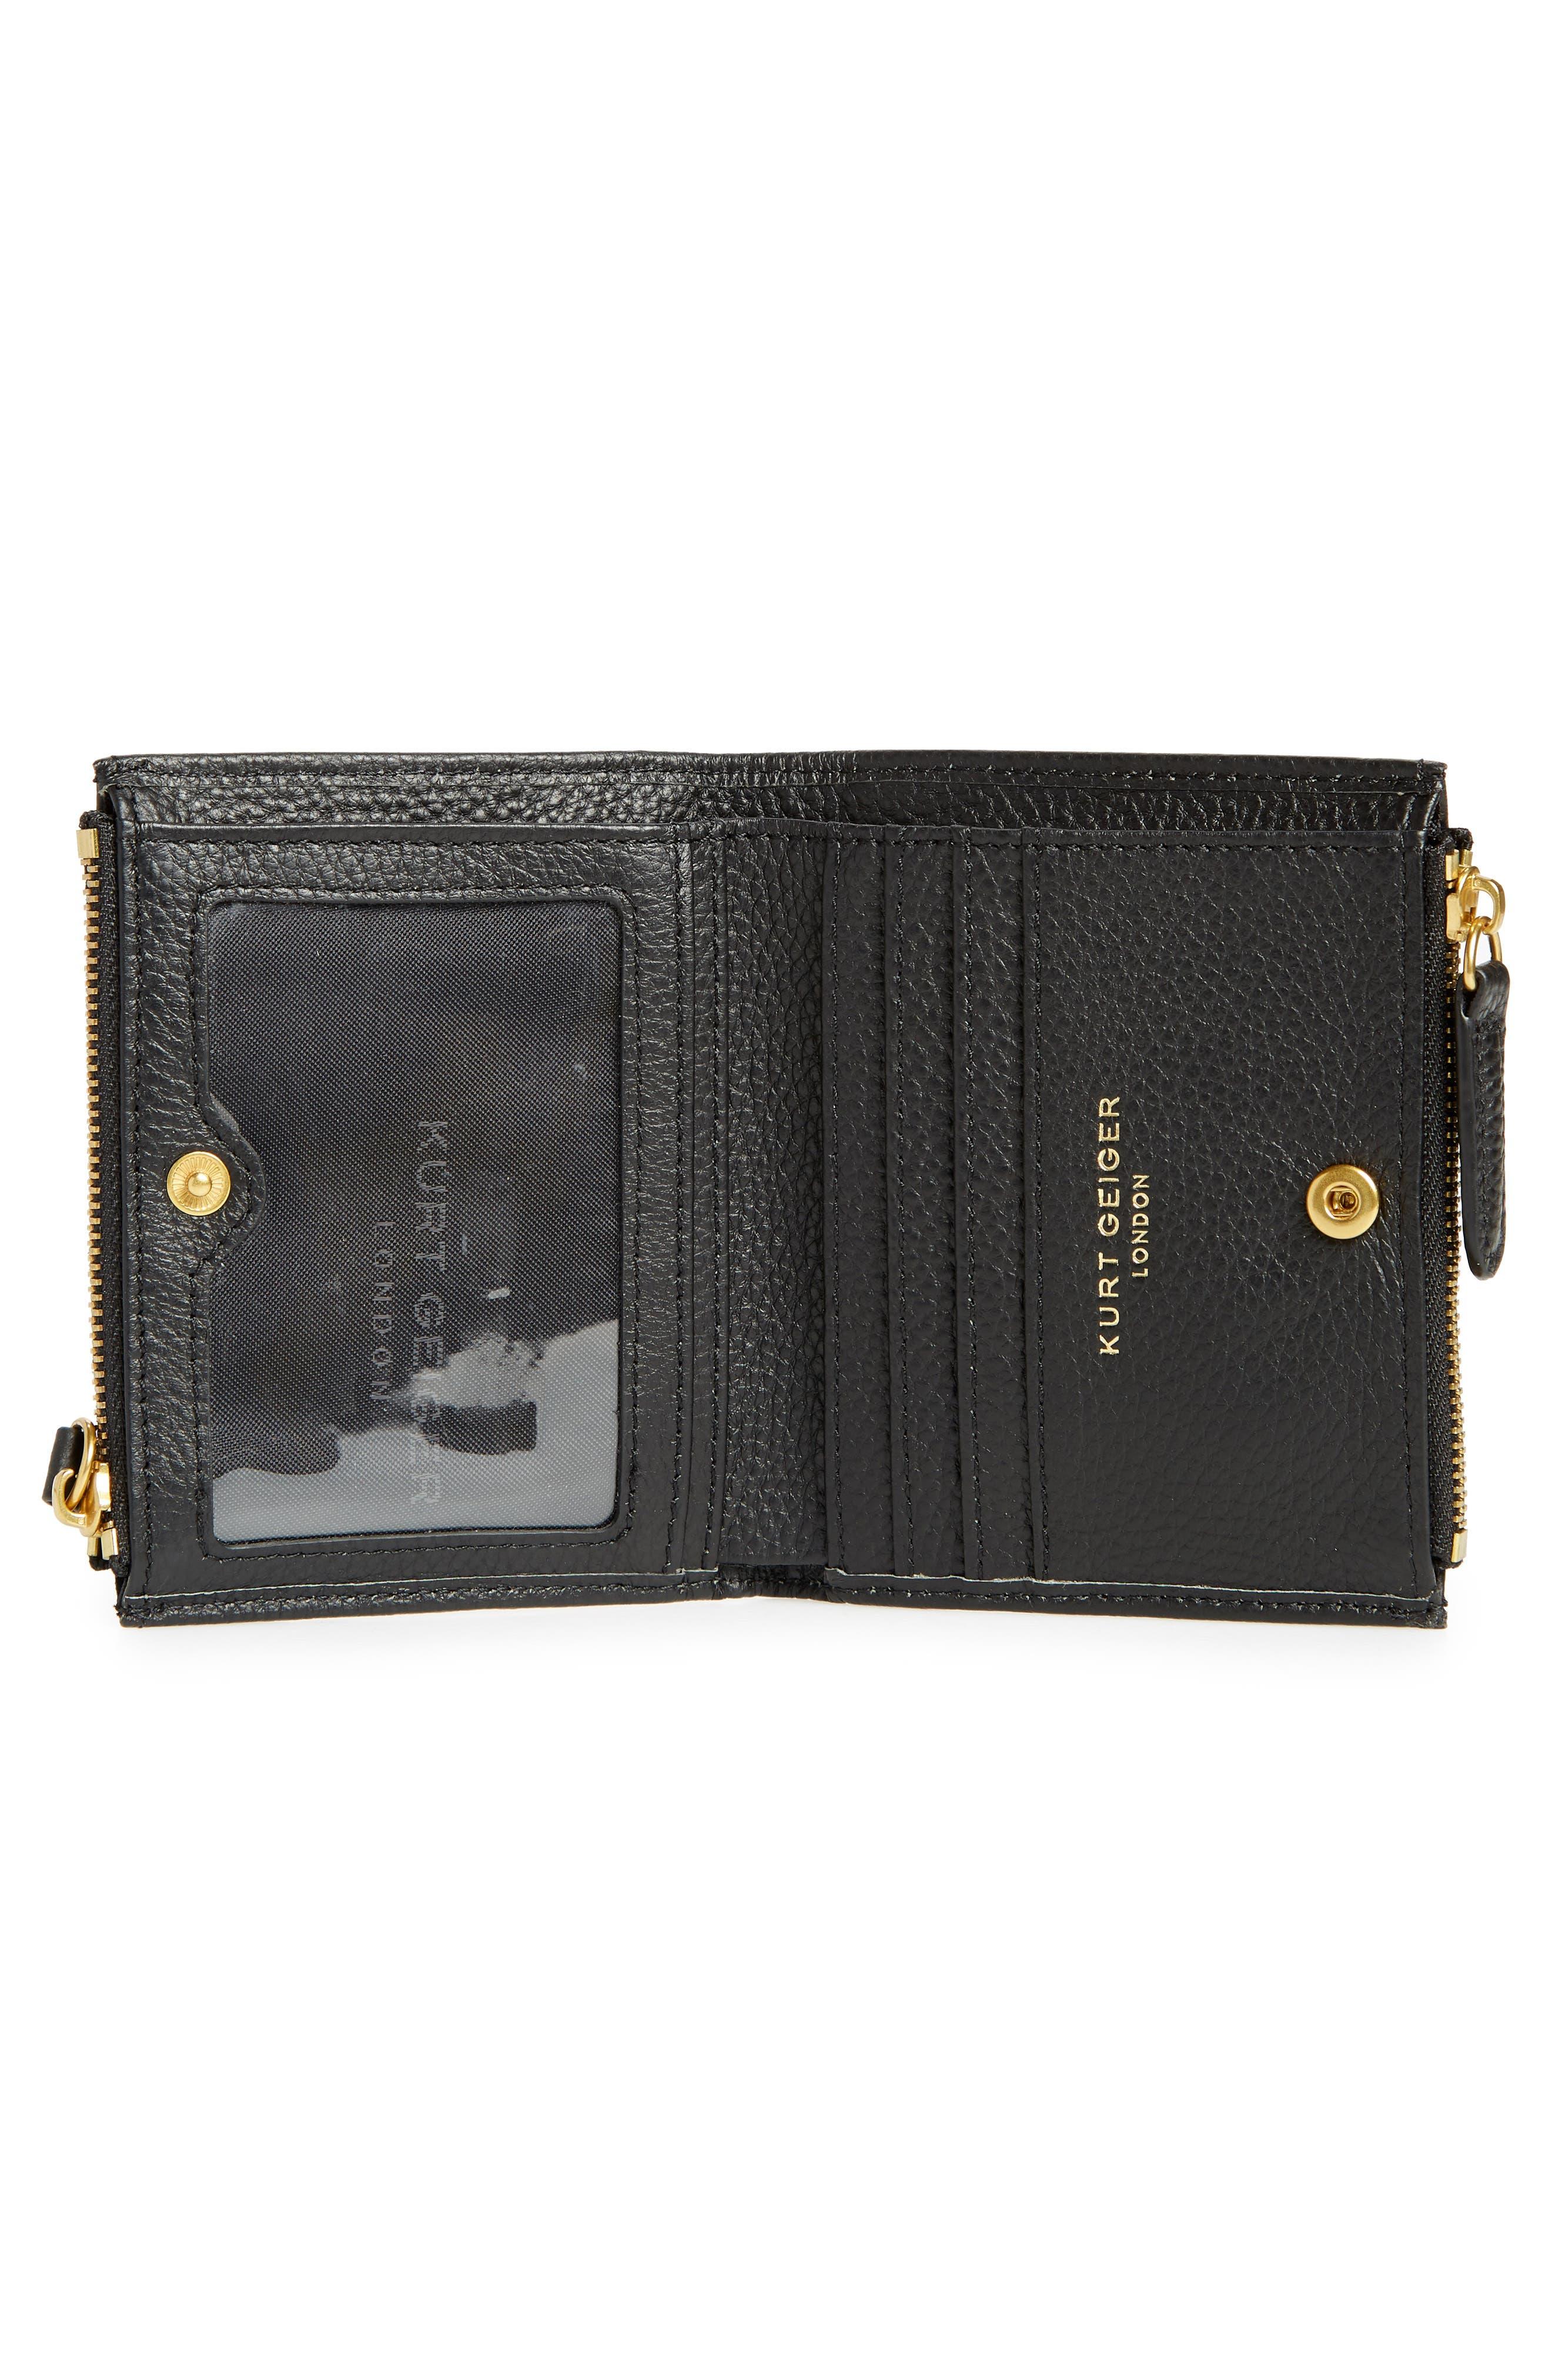 E Leather Wallet,                             Alternate thumbnail 5, color,